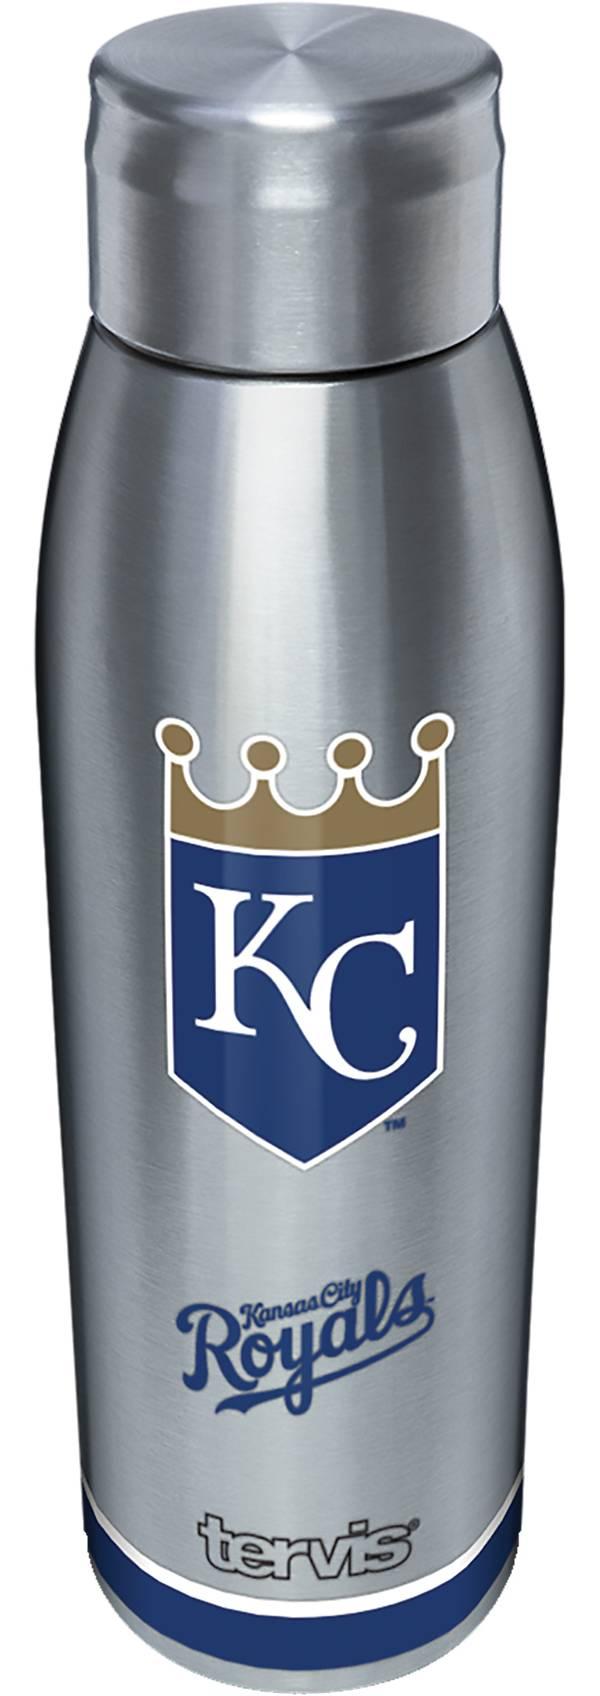 Tervis Kansas City Royals 17oz. Water Bottle product image